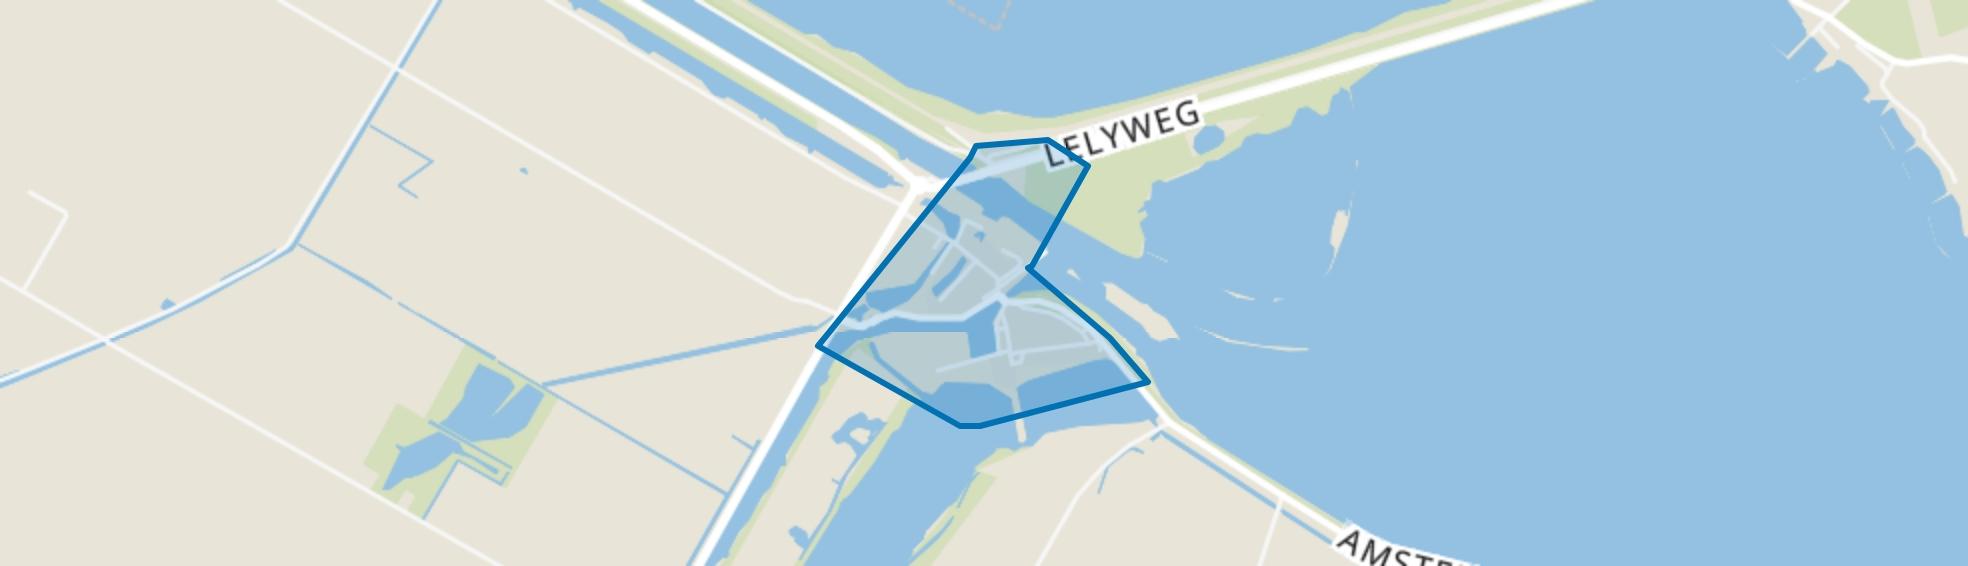 Van Ewijcksluis, Anna Paulowna map